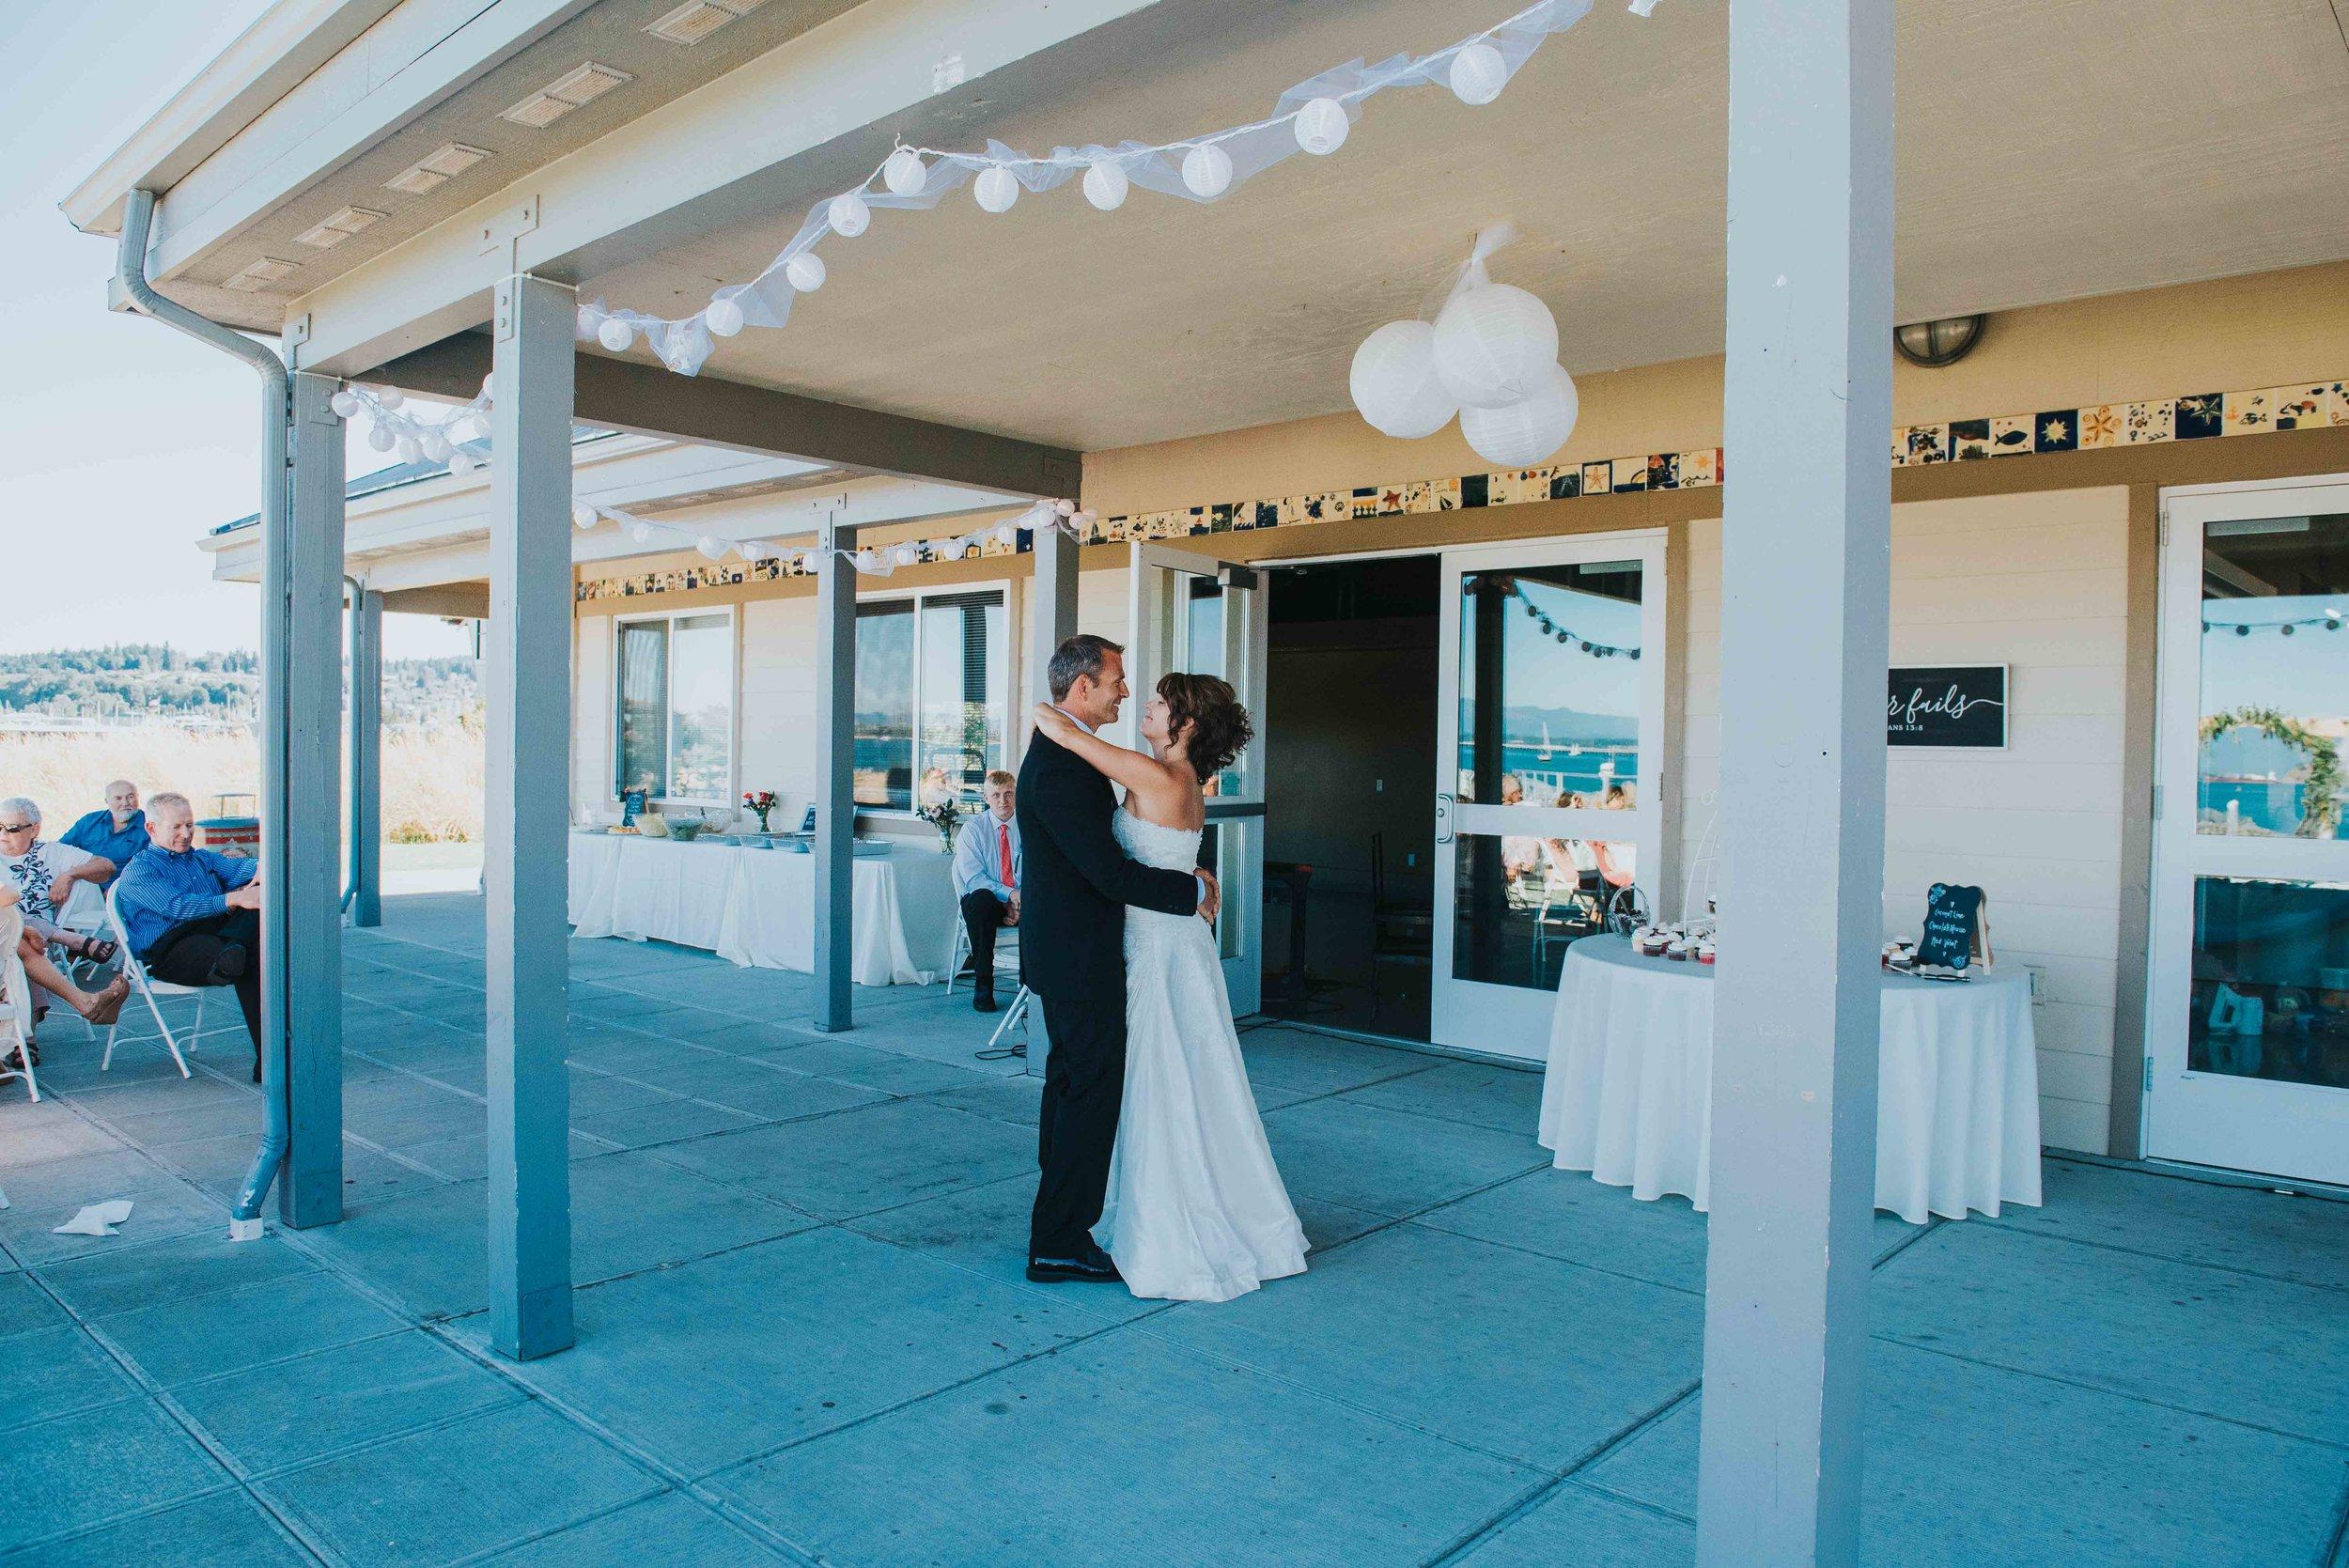 Cap-Sante-Wedding-J-Hodges-Anacortes-57.jpg